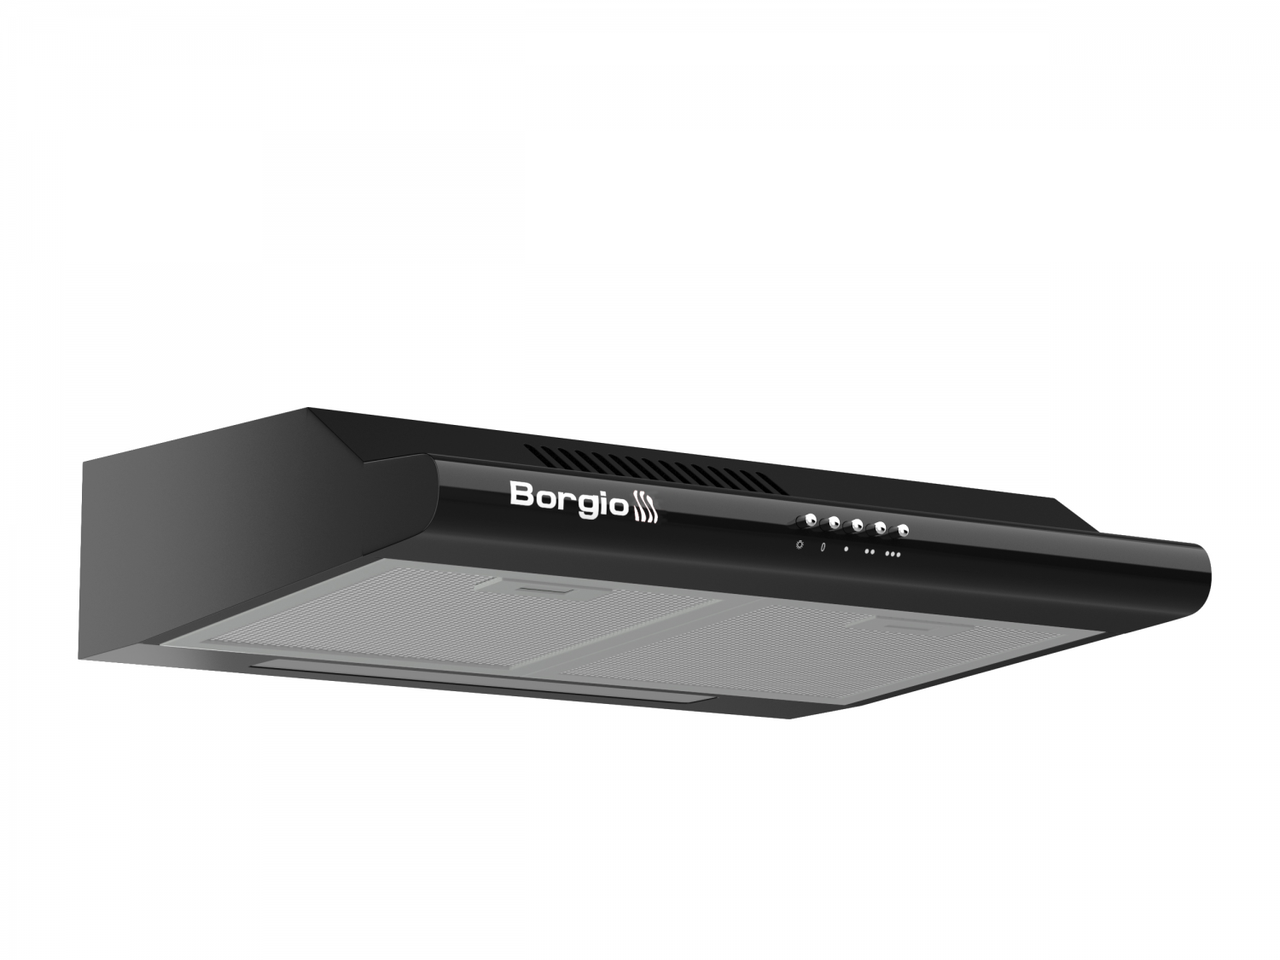 Кухонна витяжка плоска чорна BORGIO Gio 50 black